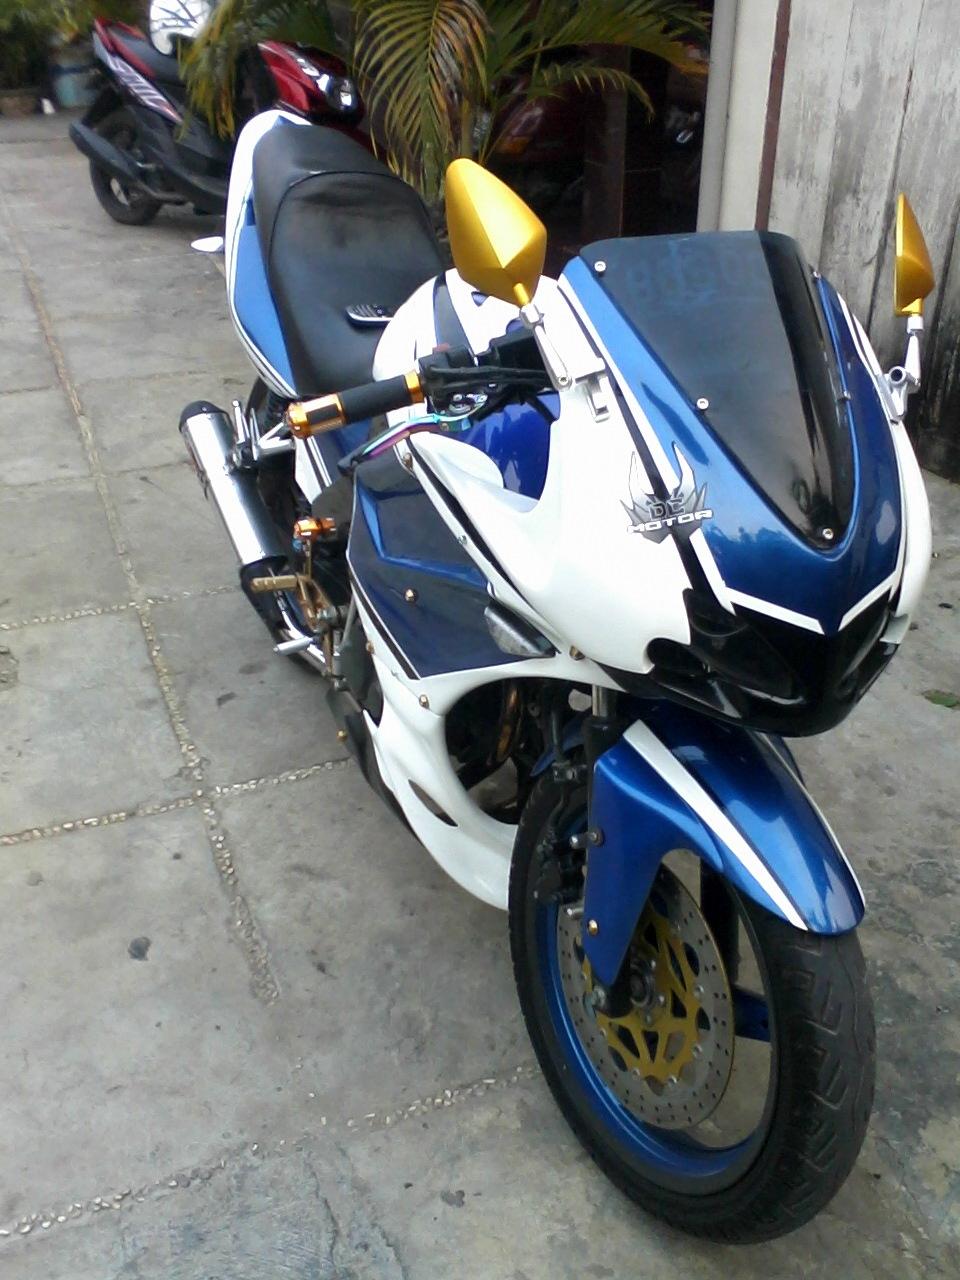 Tiger Modif Sport Full Fairing Ninja Ducati